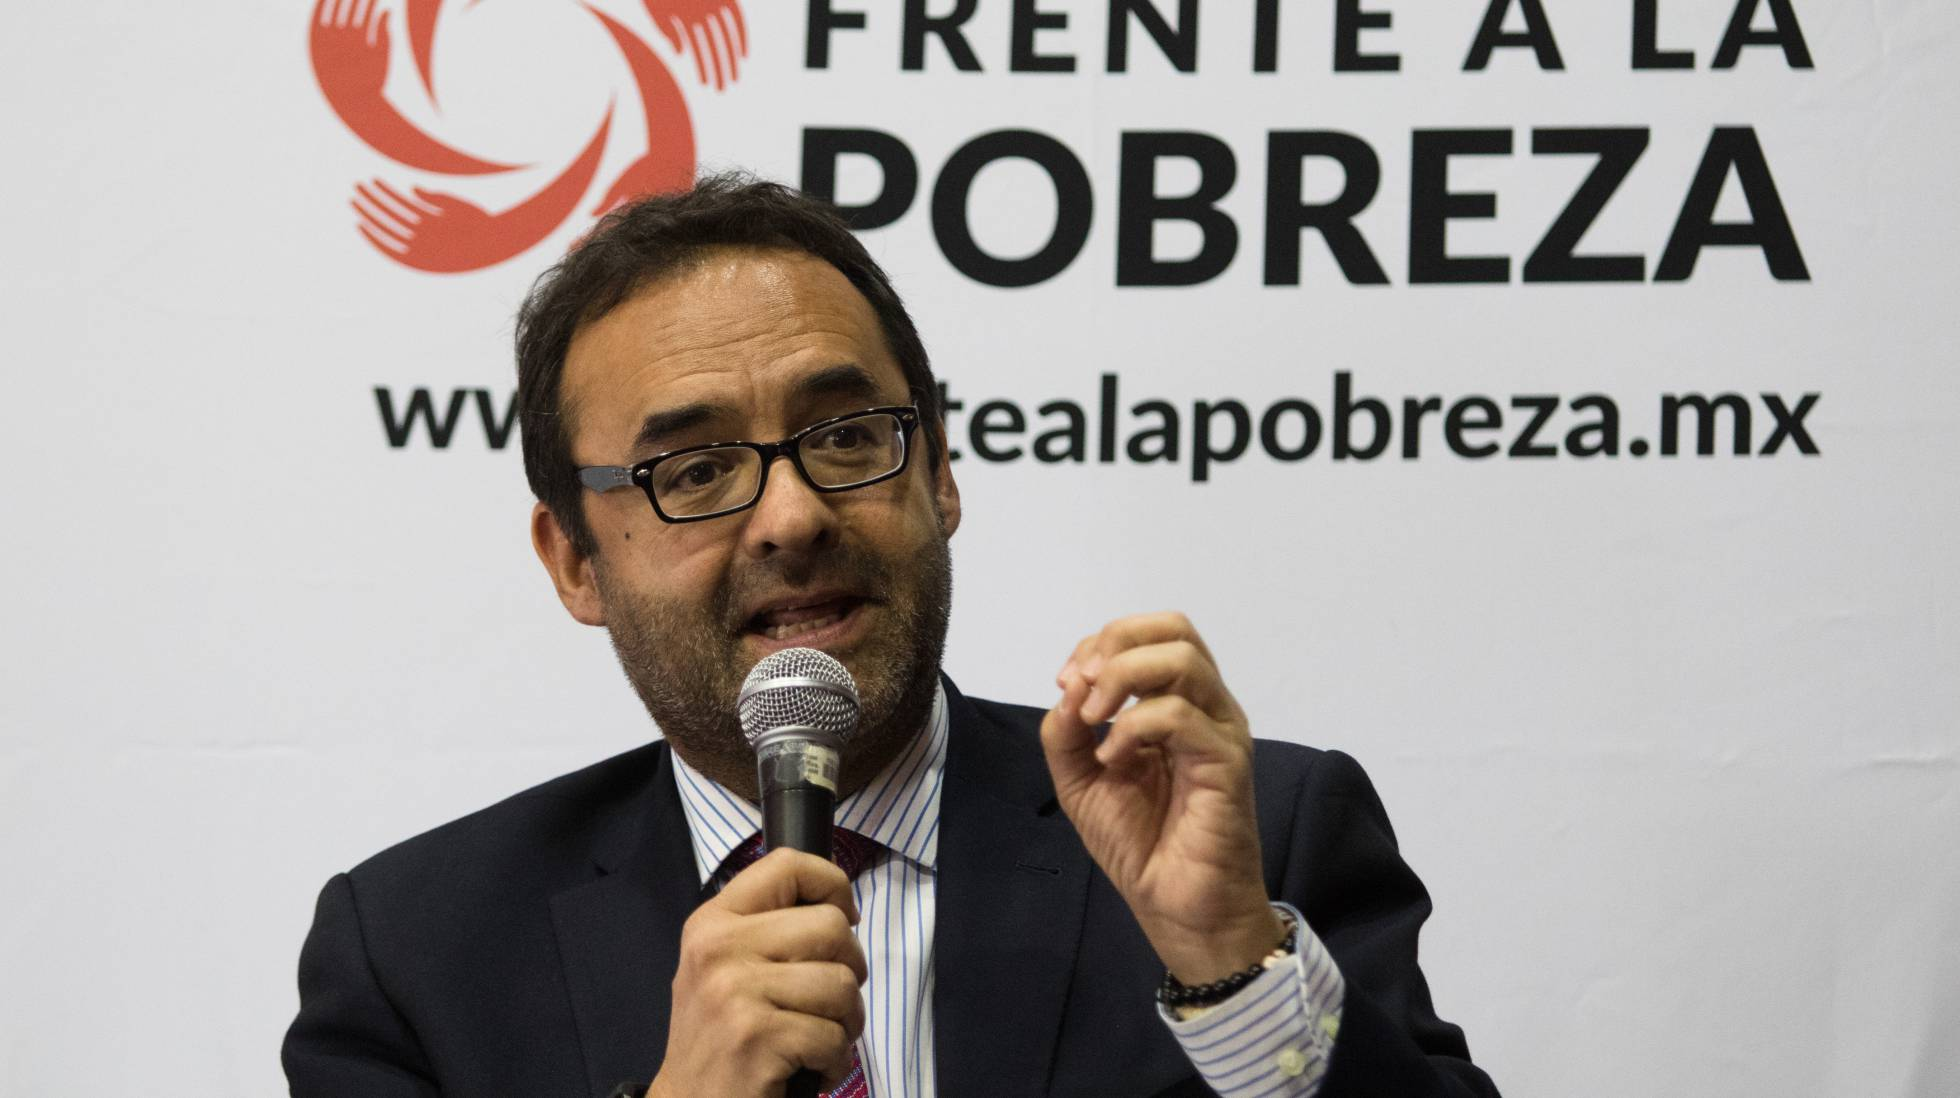 1 Gonzalo Hernandez Licona